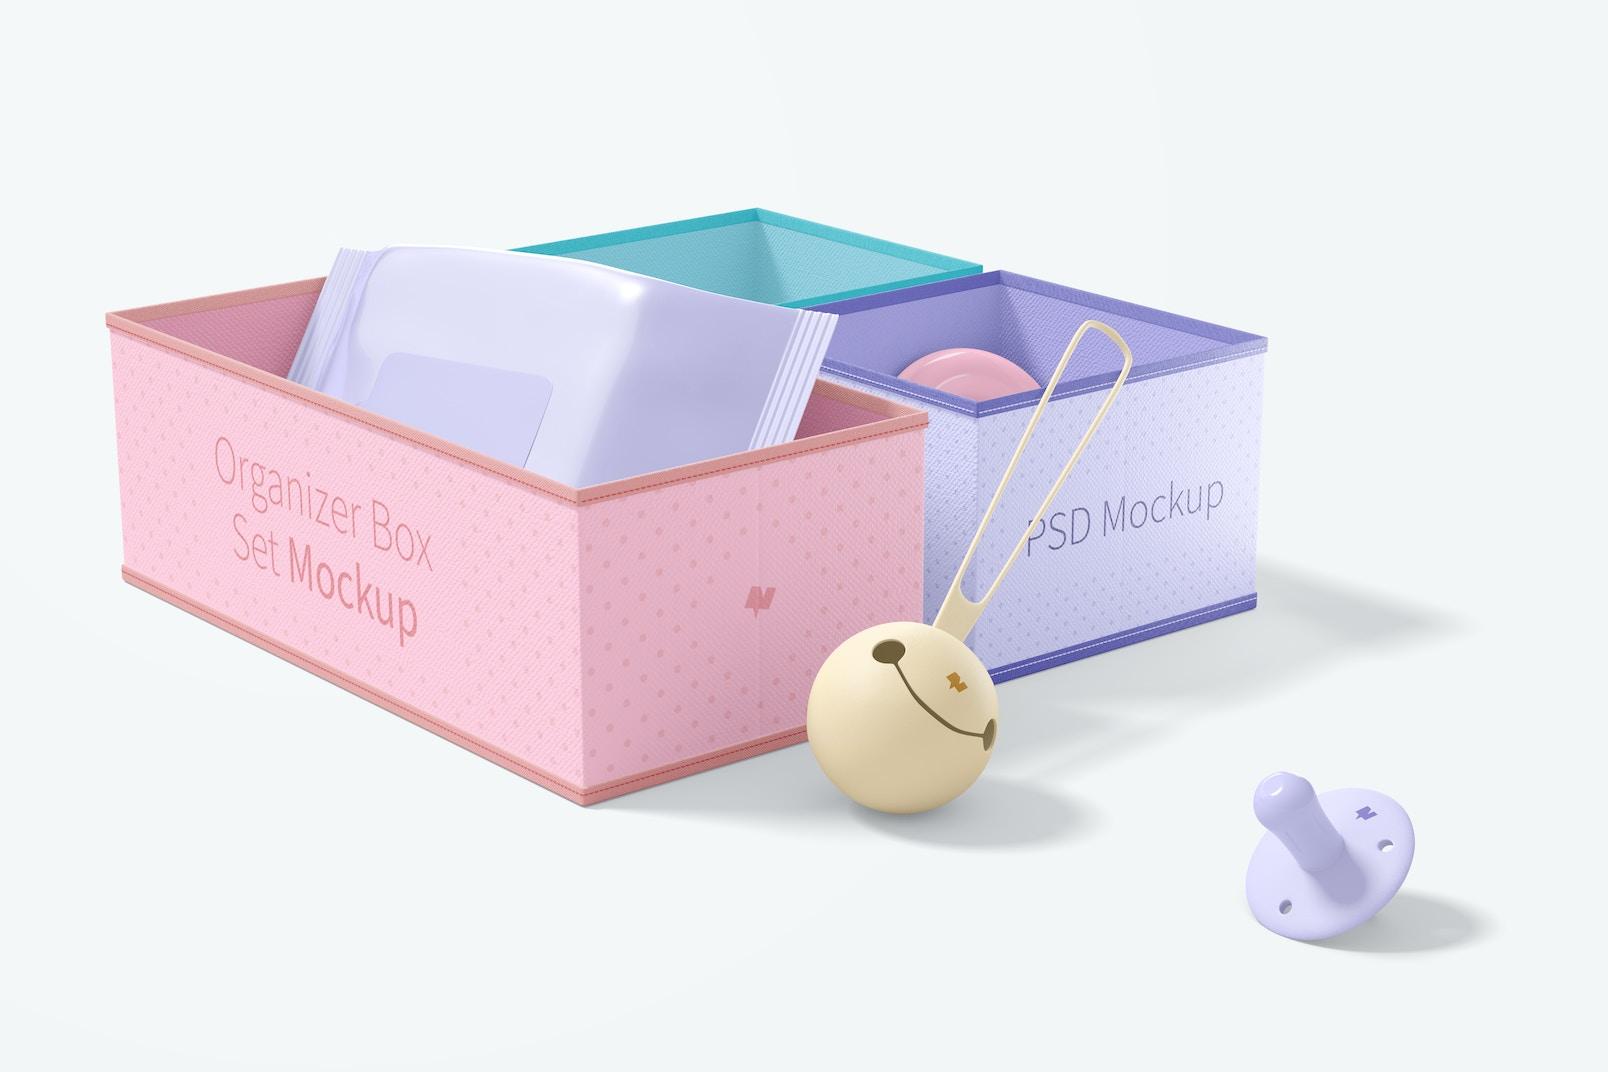 Fabric Organizer Box Set Mockup, Perspective